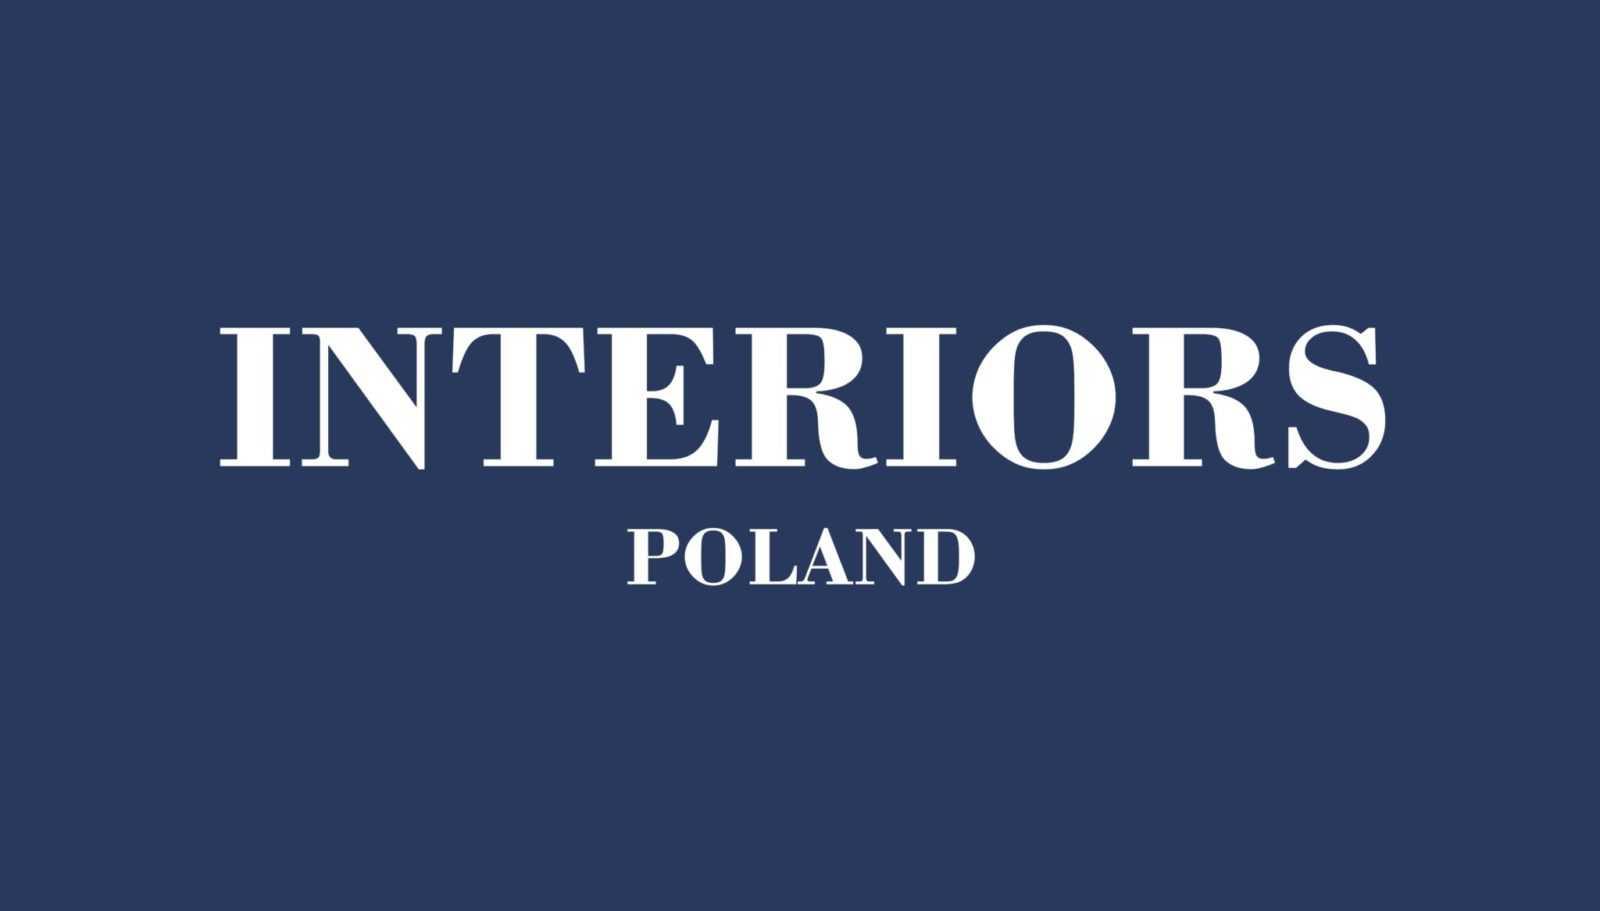 Interiors Poland